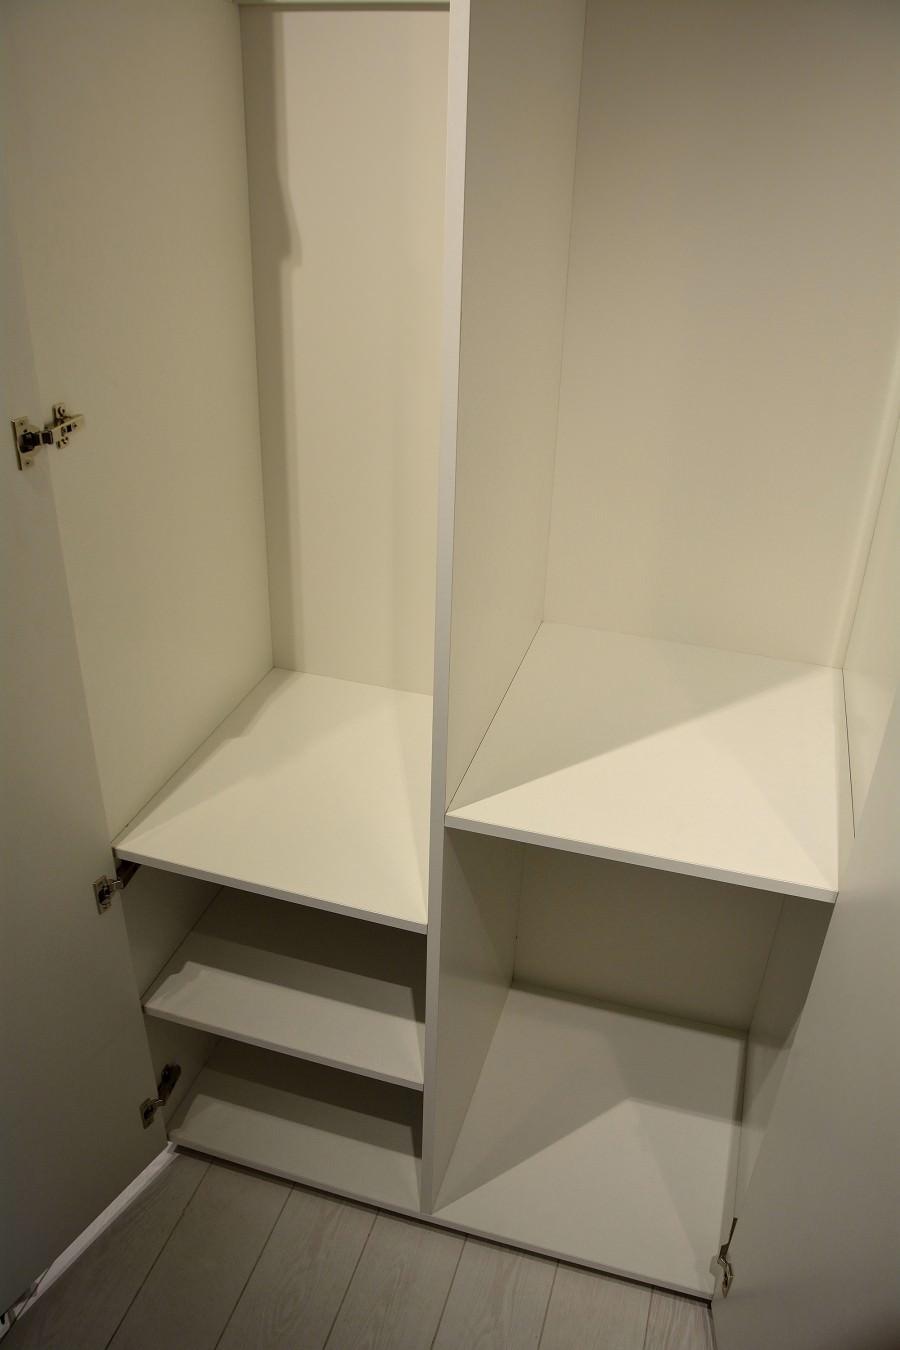 Spatiu interior dressing realizat din pal alb cu usi din mdf Vopsit Mat Gri 900x1350 1